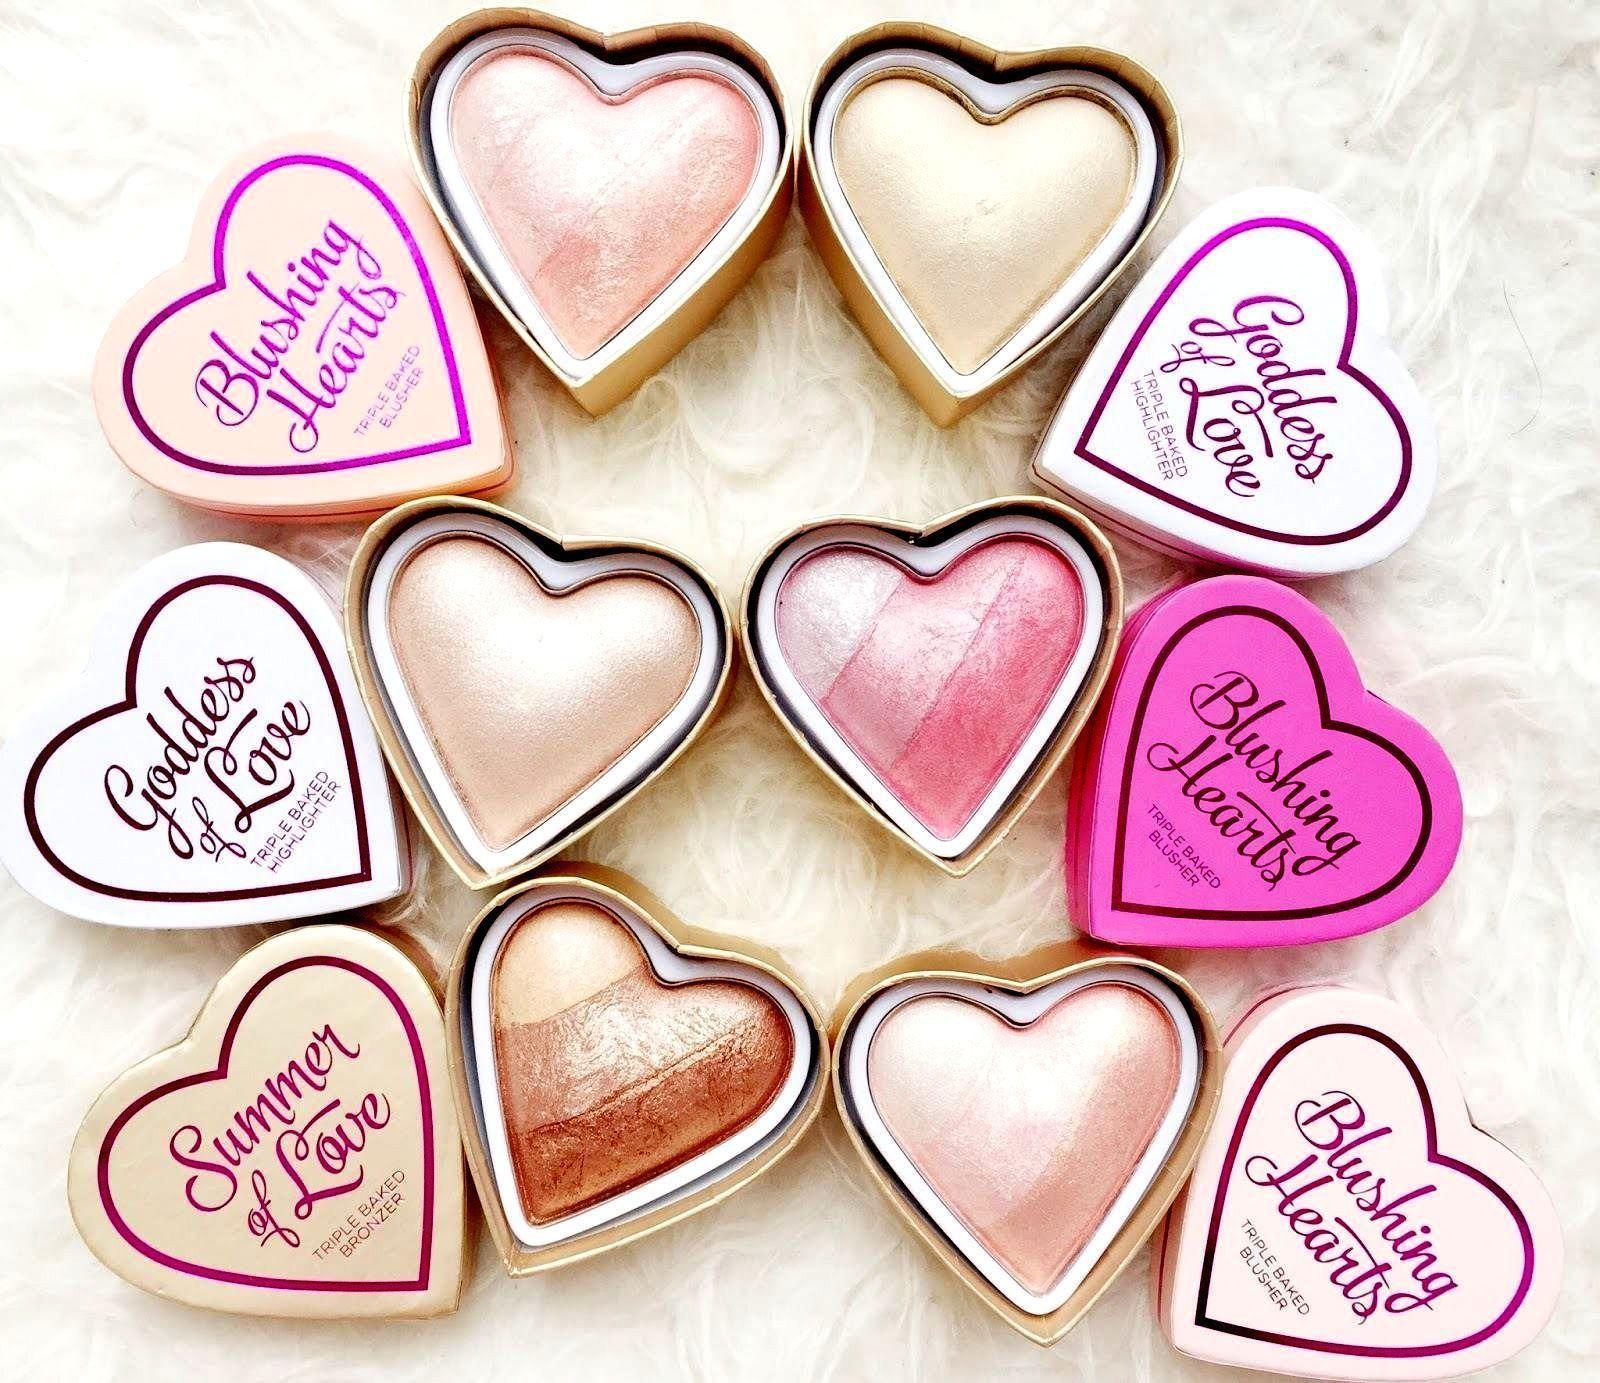 MAKEUP REVOLUTION I ♡ Makeup 'Blushing Hearts' Baked